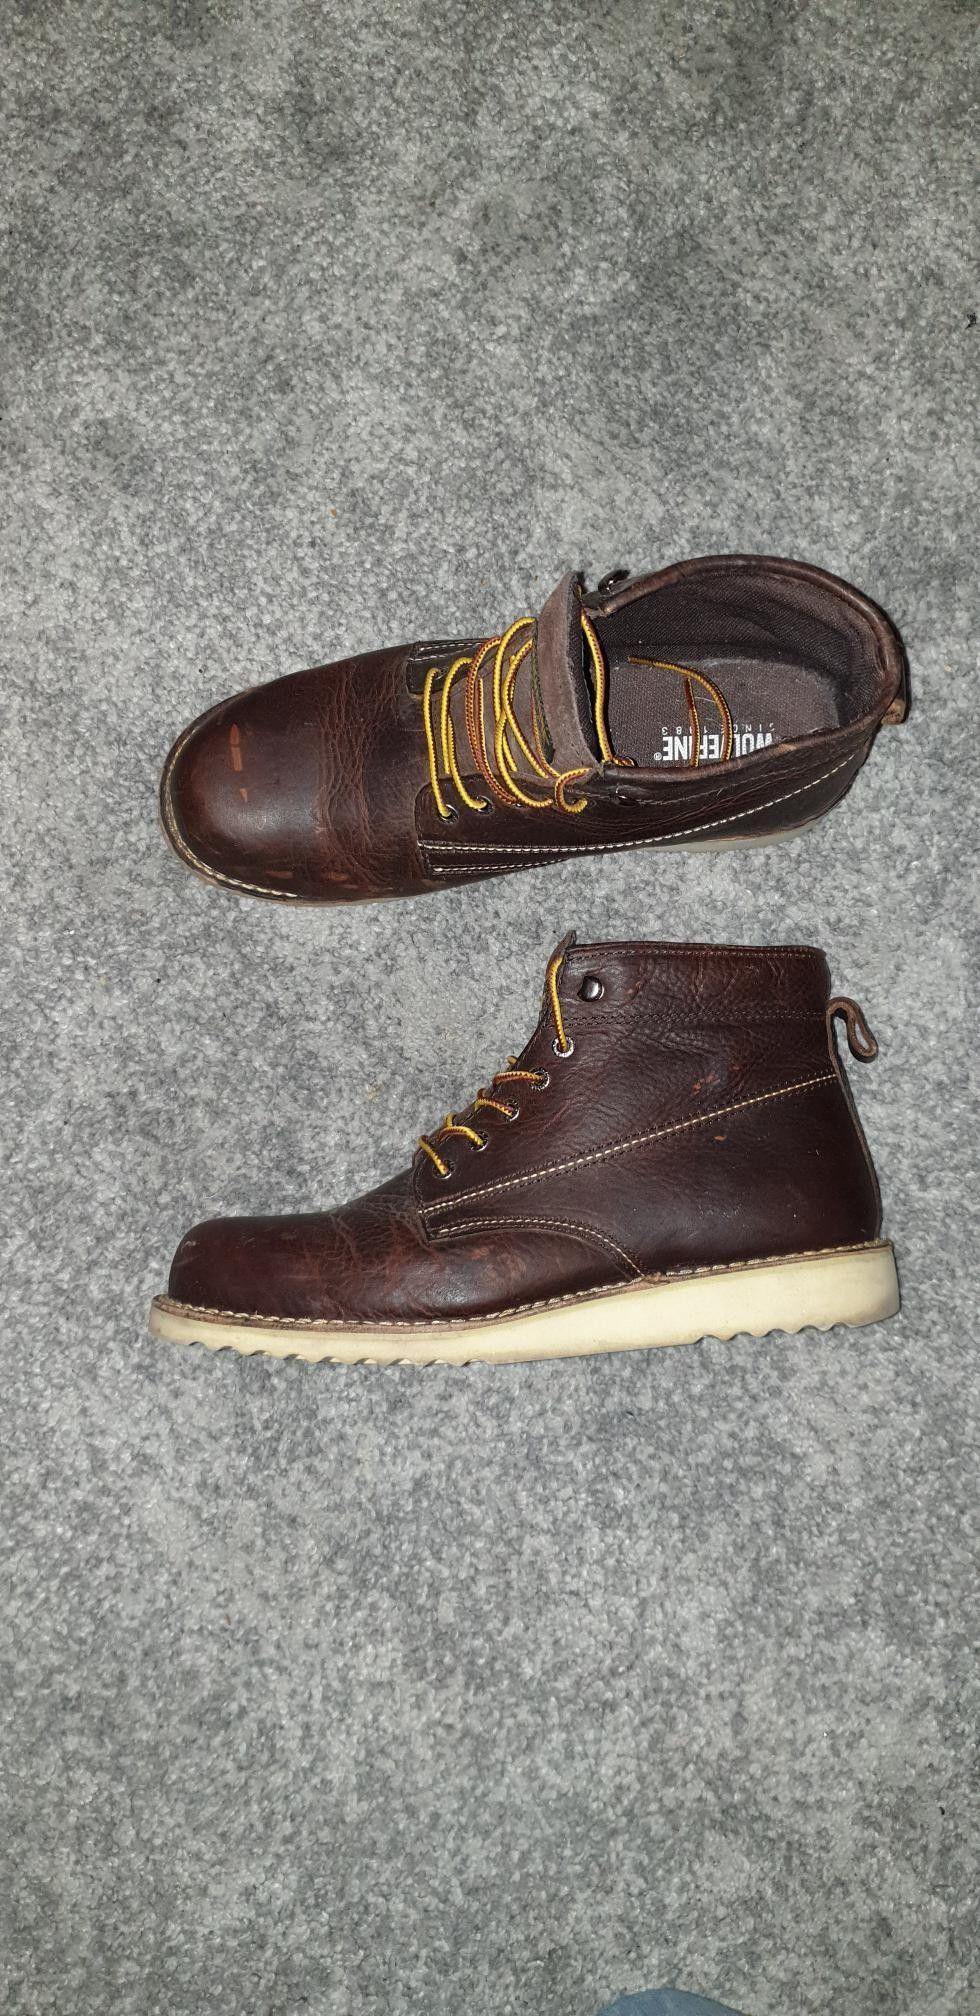 Wolverine Boots | FINN.no